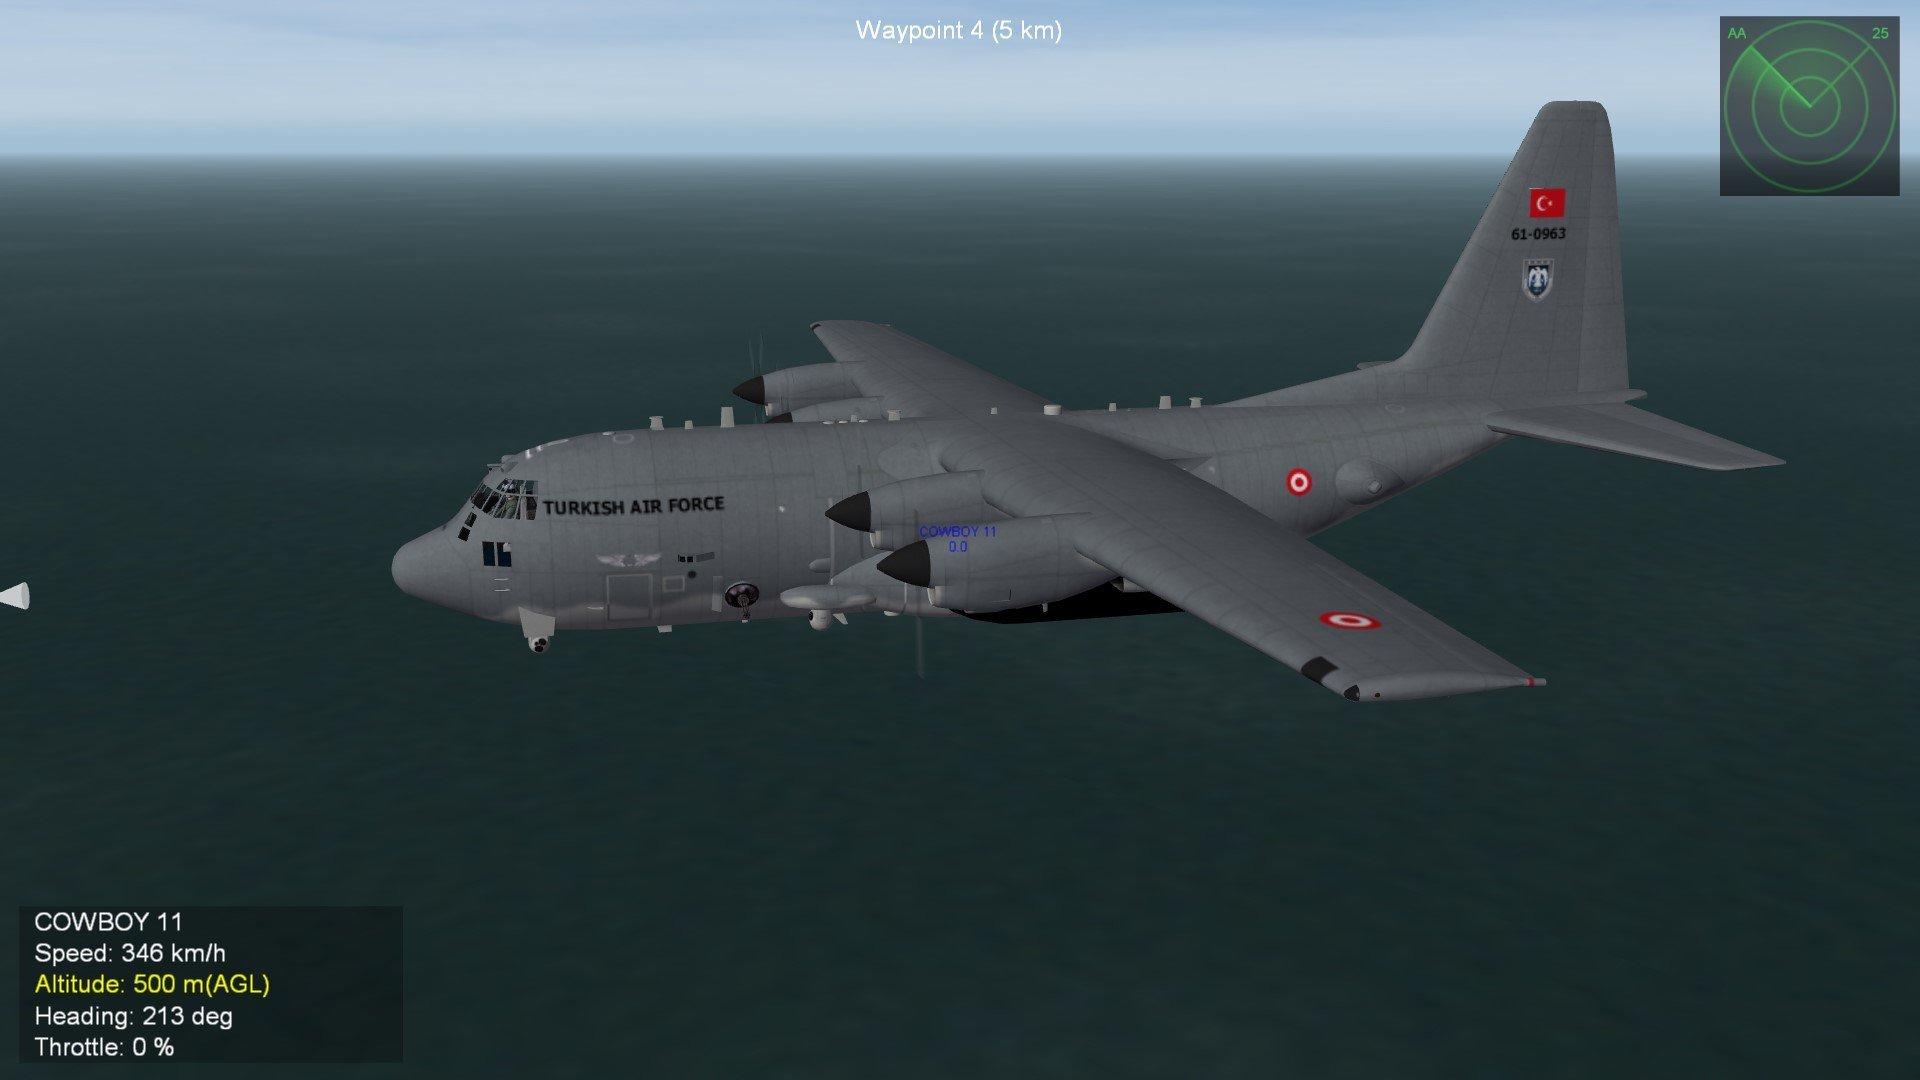 Turkish Air Force AC-130U Spooky